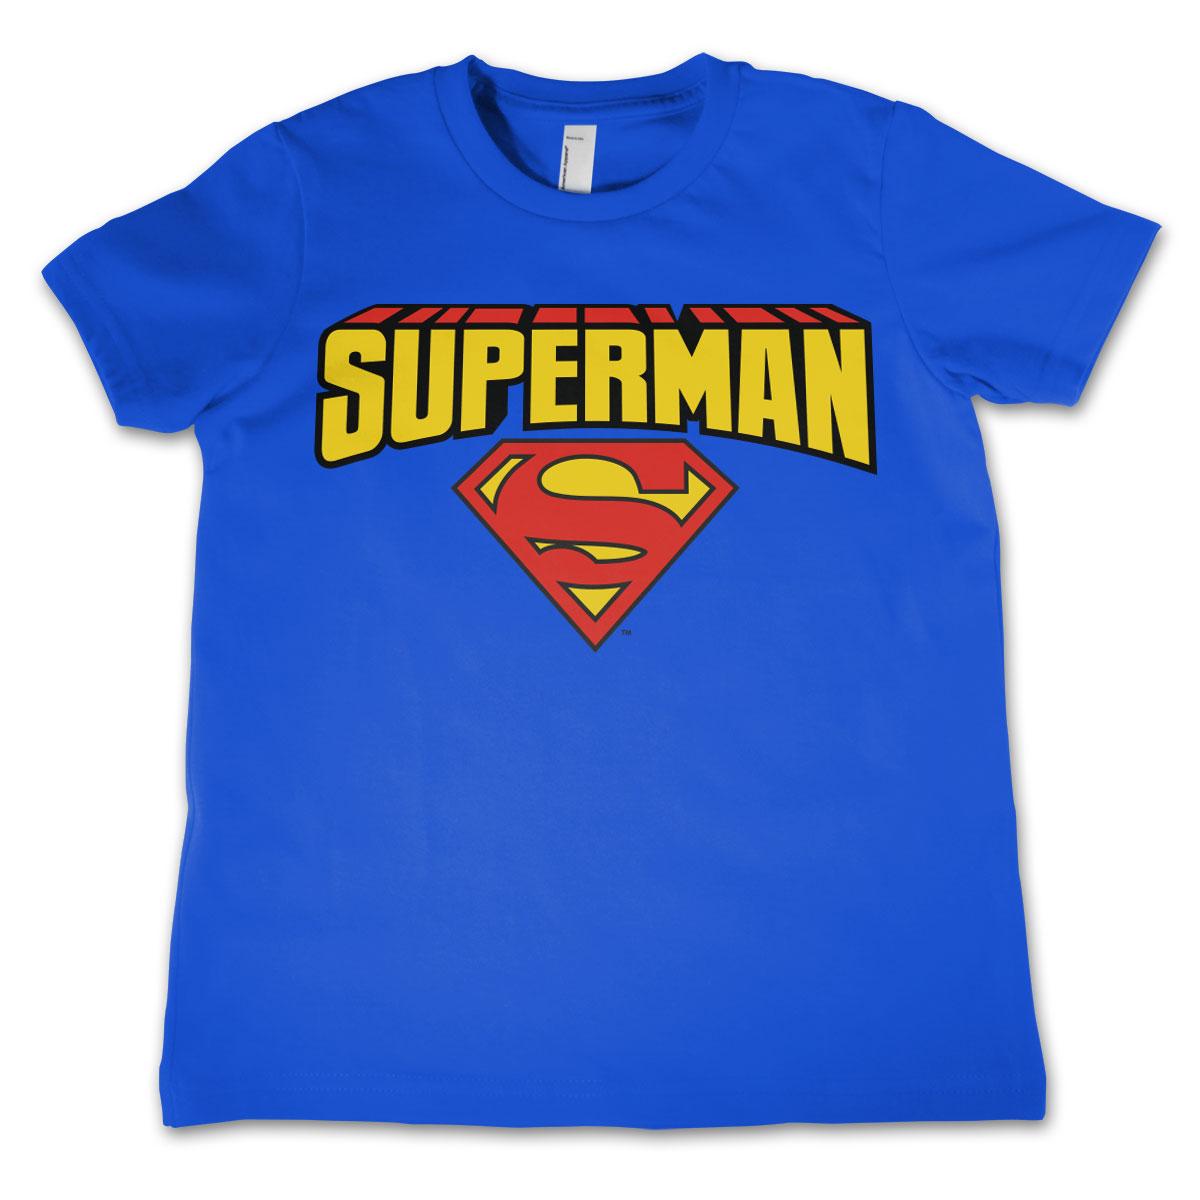 Superman Blockletter Logo Kids T-Shirt